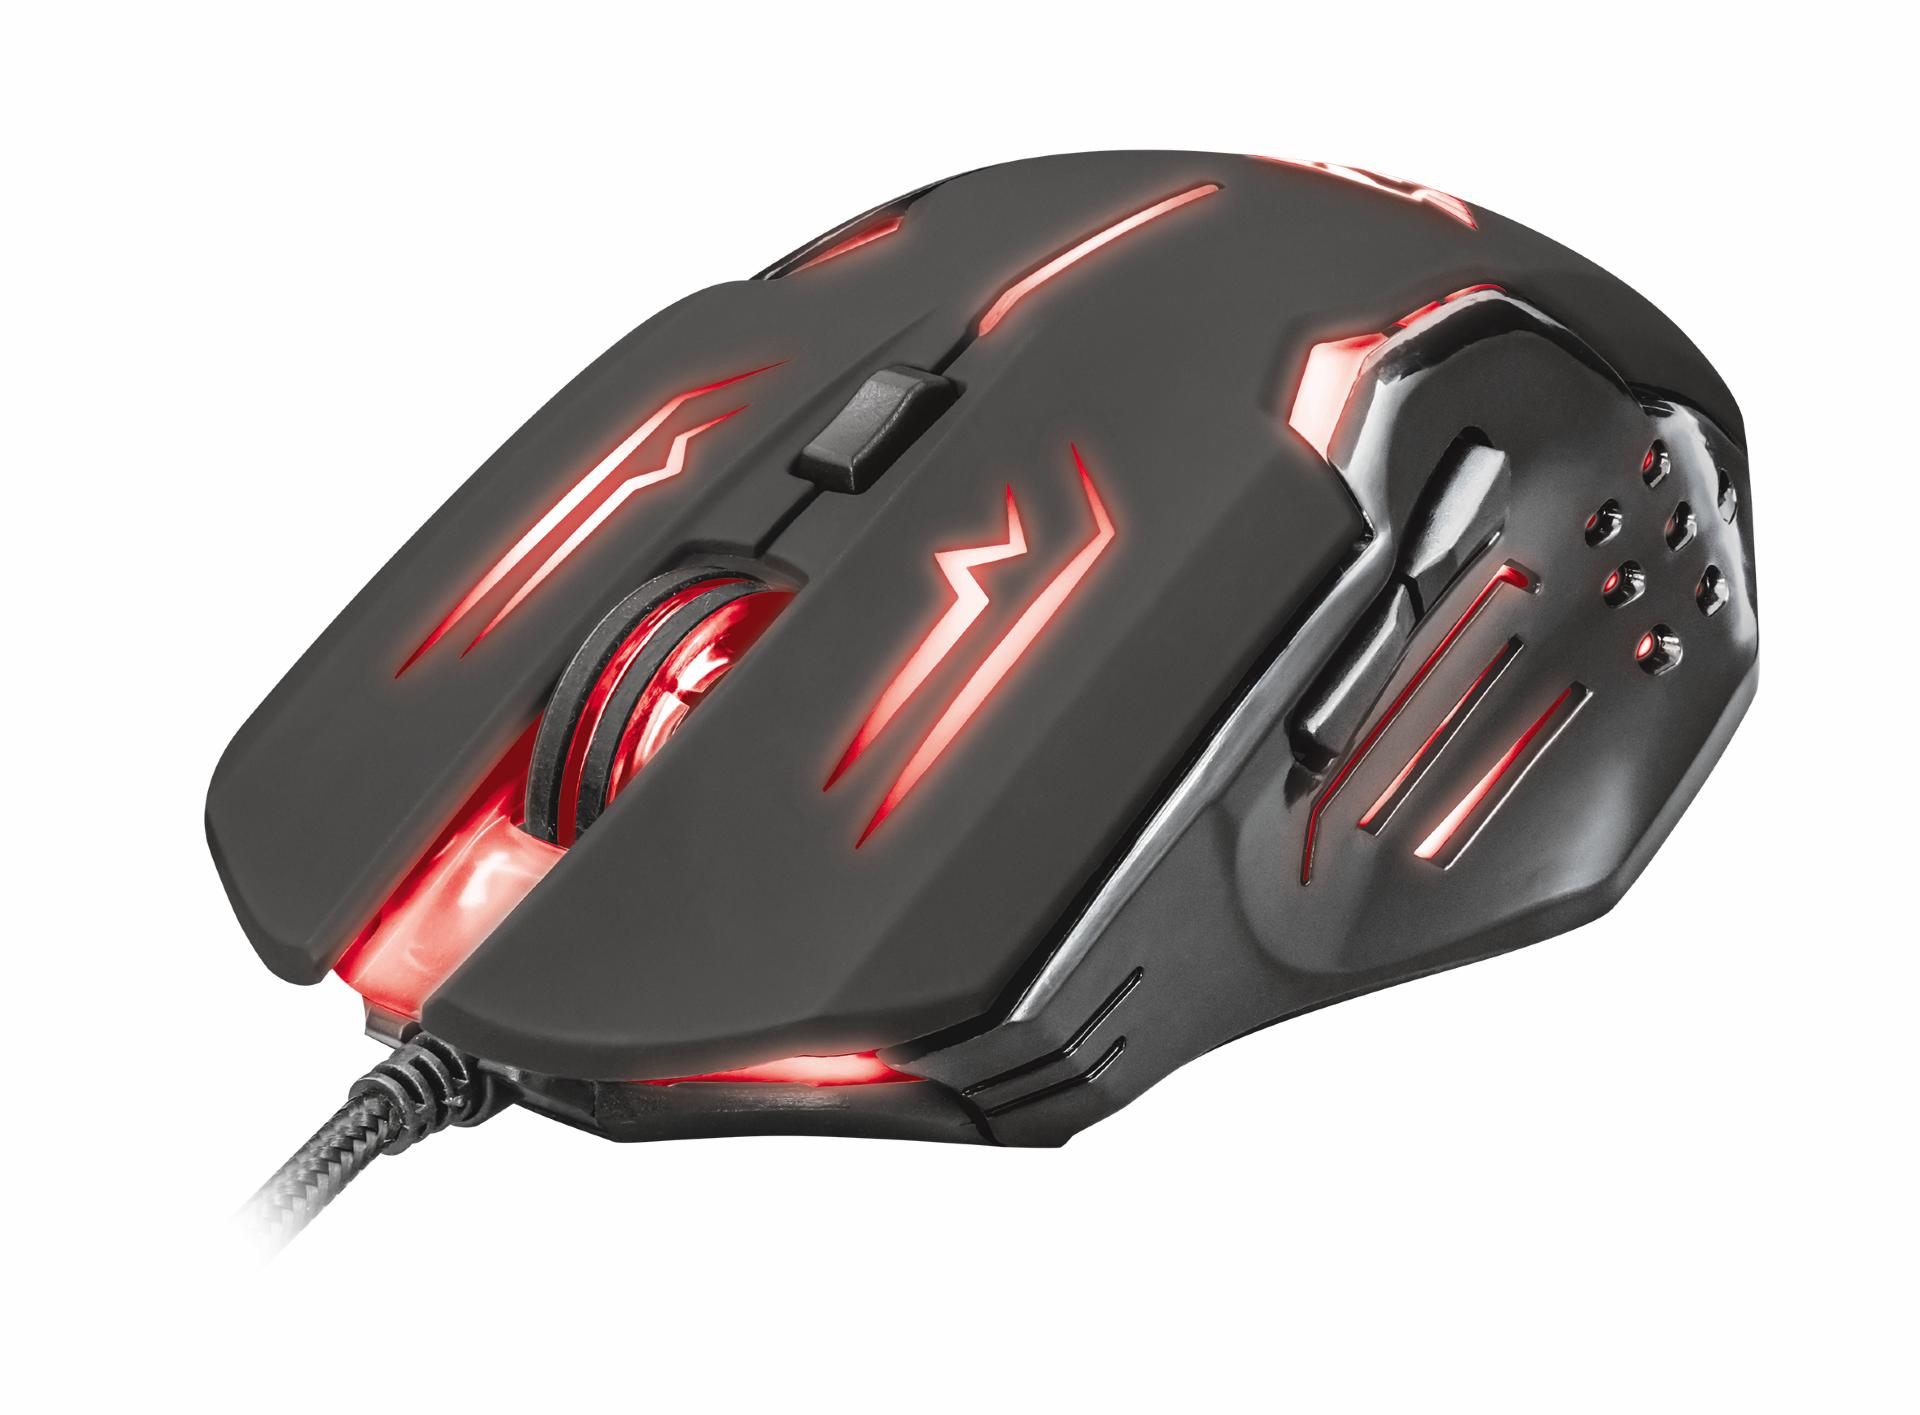 myš TRUST GXT 108 Rava Illuminated Gaming Mouse